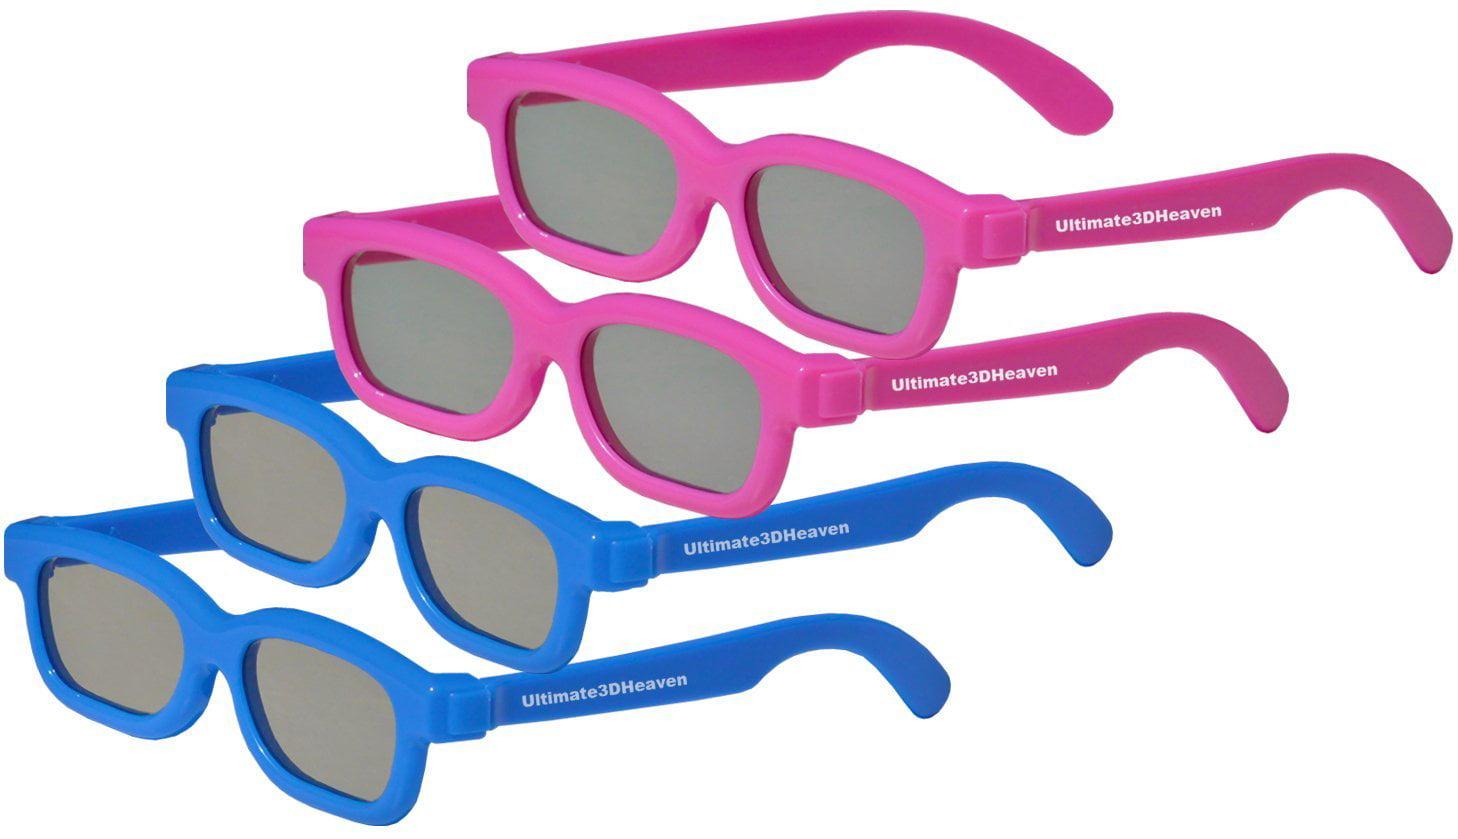 f15b06c8538 10 Pairs - Children s Passive 3D Glasses for Kids - Genuine Ultimate 3D  Heaven Sealed for LG